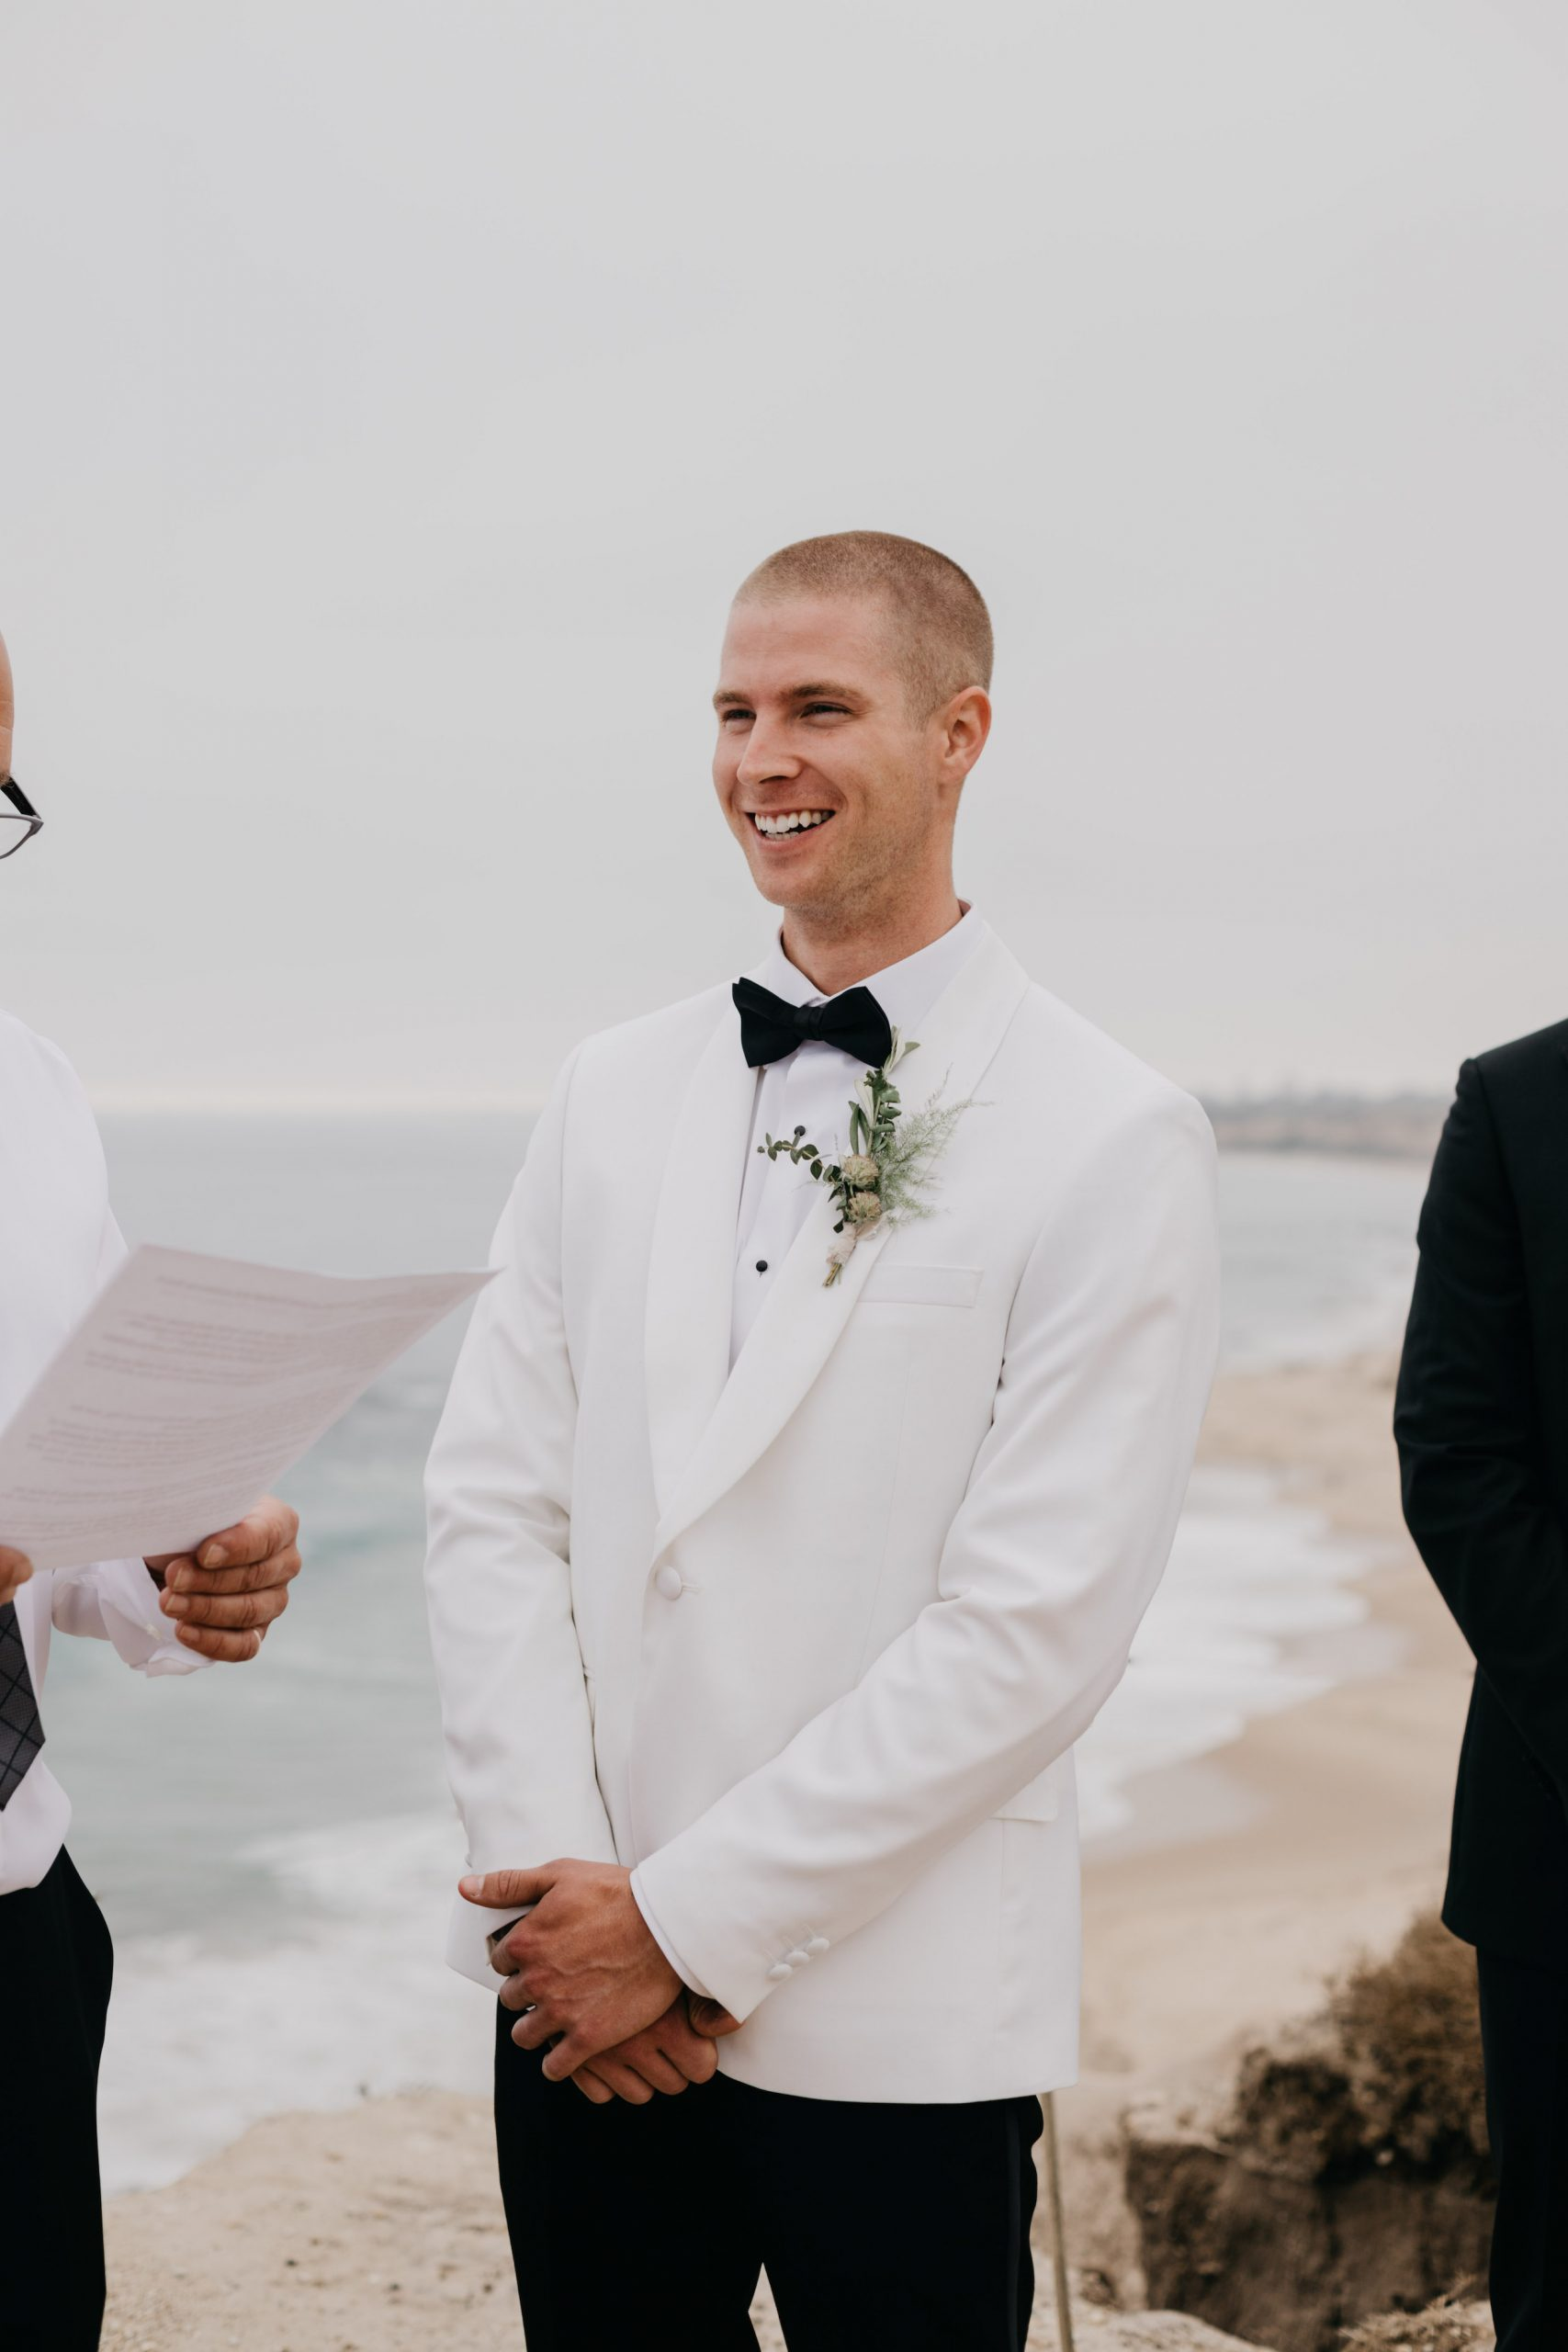 Groom in Ceremony in Crystal Cove State Park Wedding in Laguna Beach, image by Fatima Elreda Photo